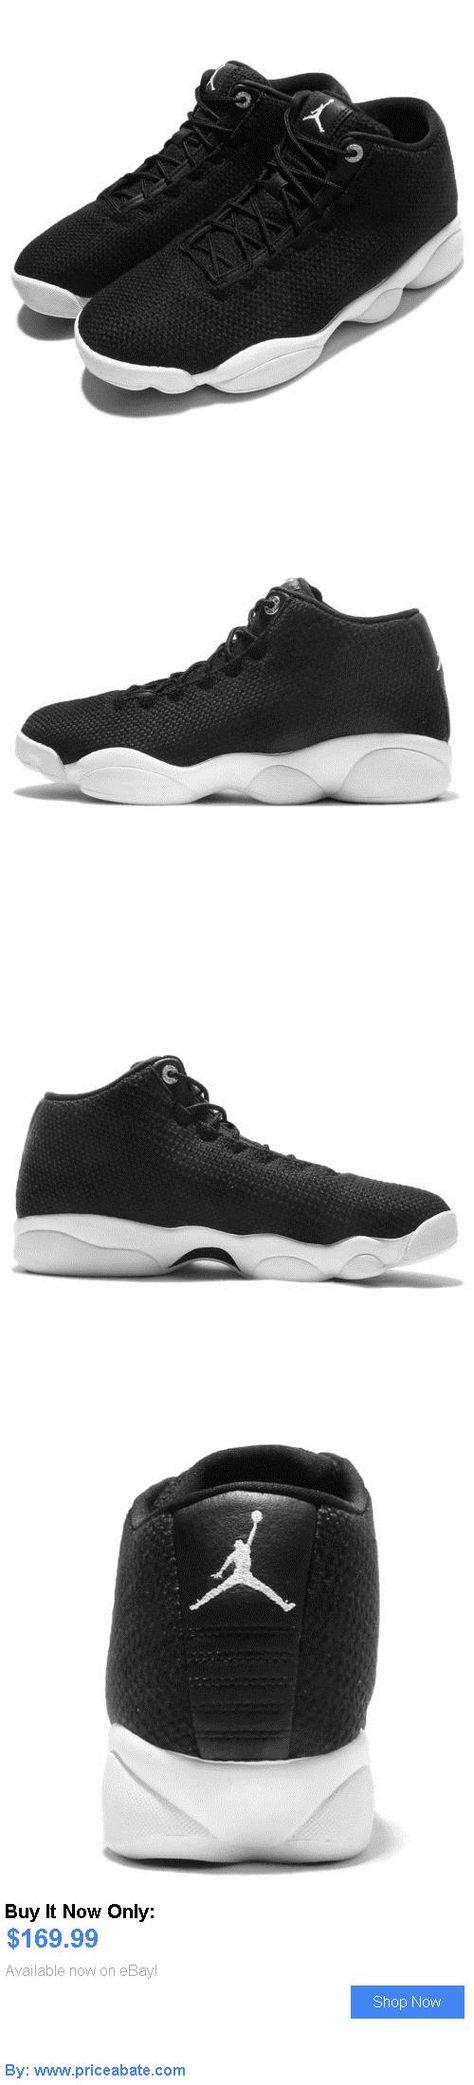 57da7fc85537cf Basketball  Nike Jordan Horizon Low Black White Mens Basketball Shoe Air  Sneakers 845098-006 BUY IT NOW ONLY   169.99  priceabateBasketball OR   priceabate